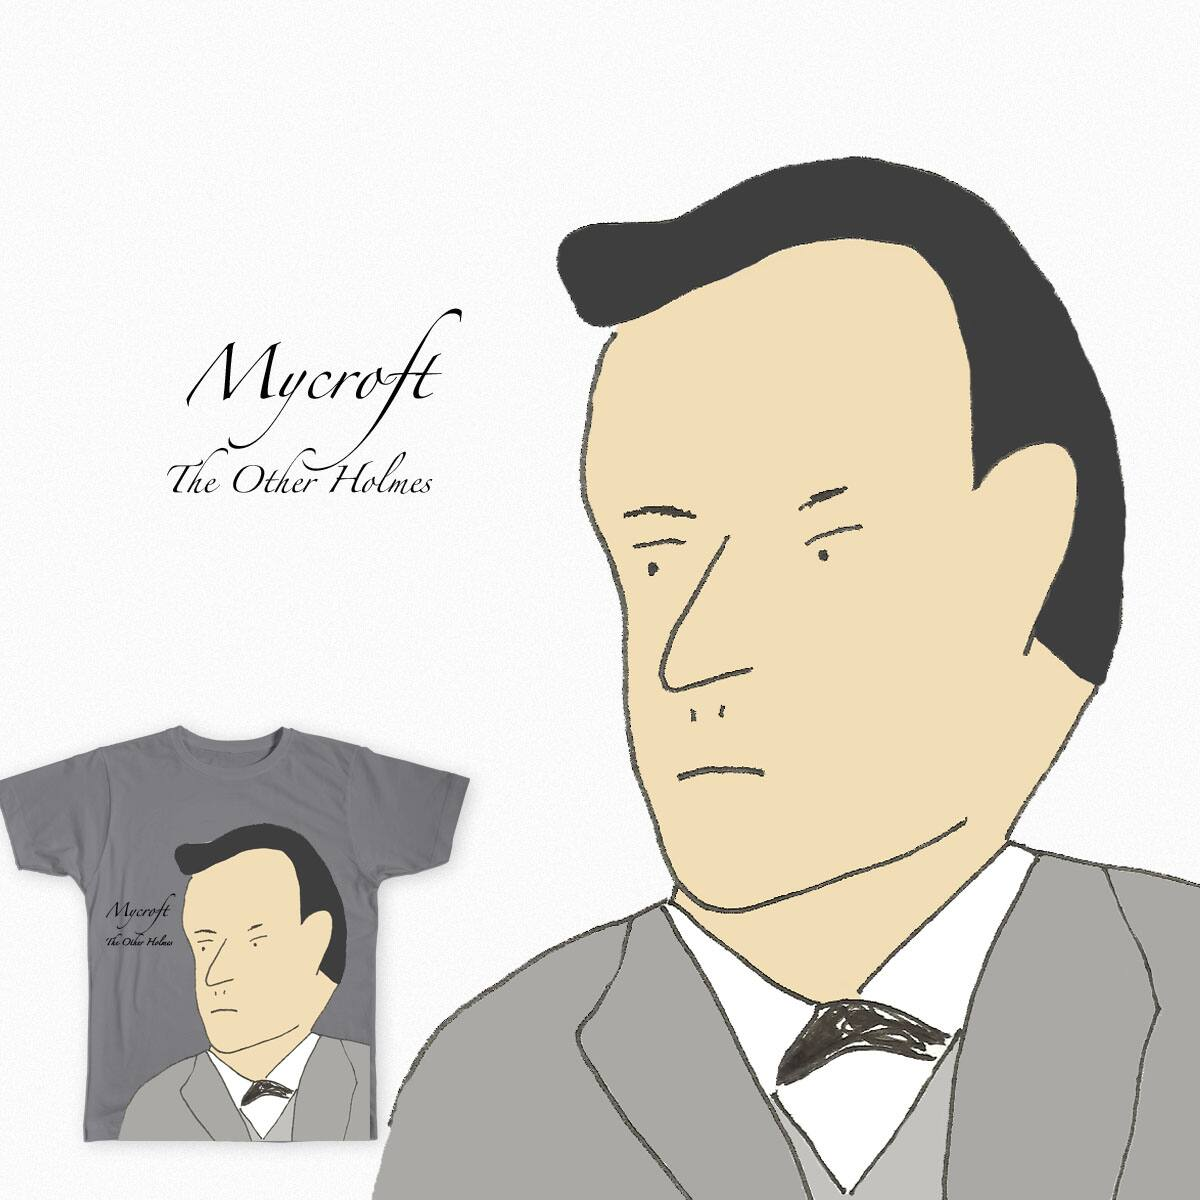 Sherlock's Brother Mycroft by cmschulz on Threadless